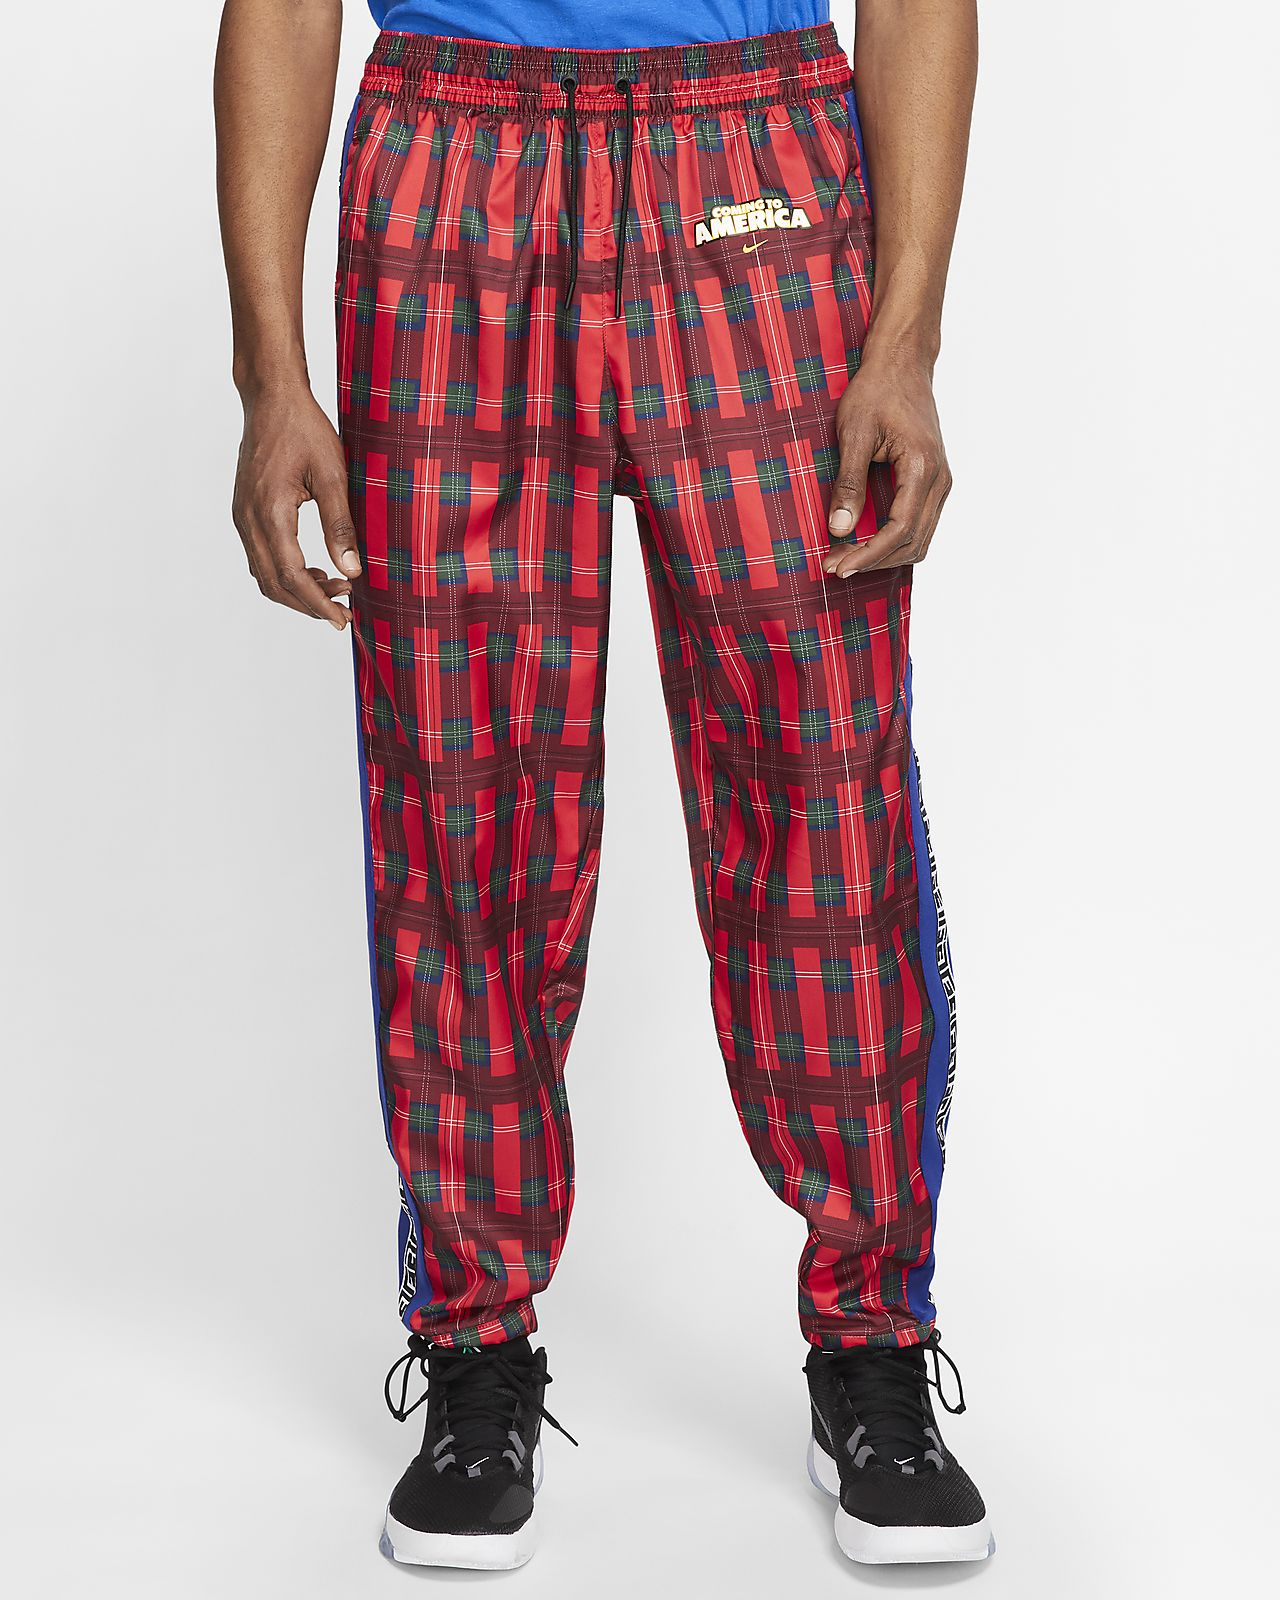 Nike Giannis 男子篮球长裤